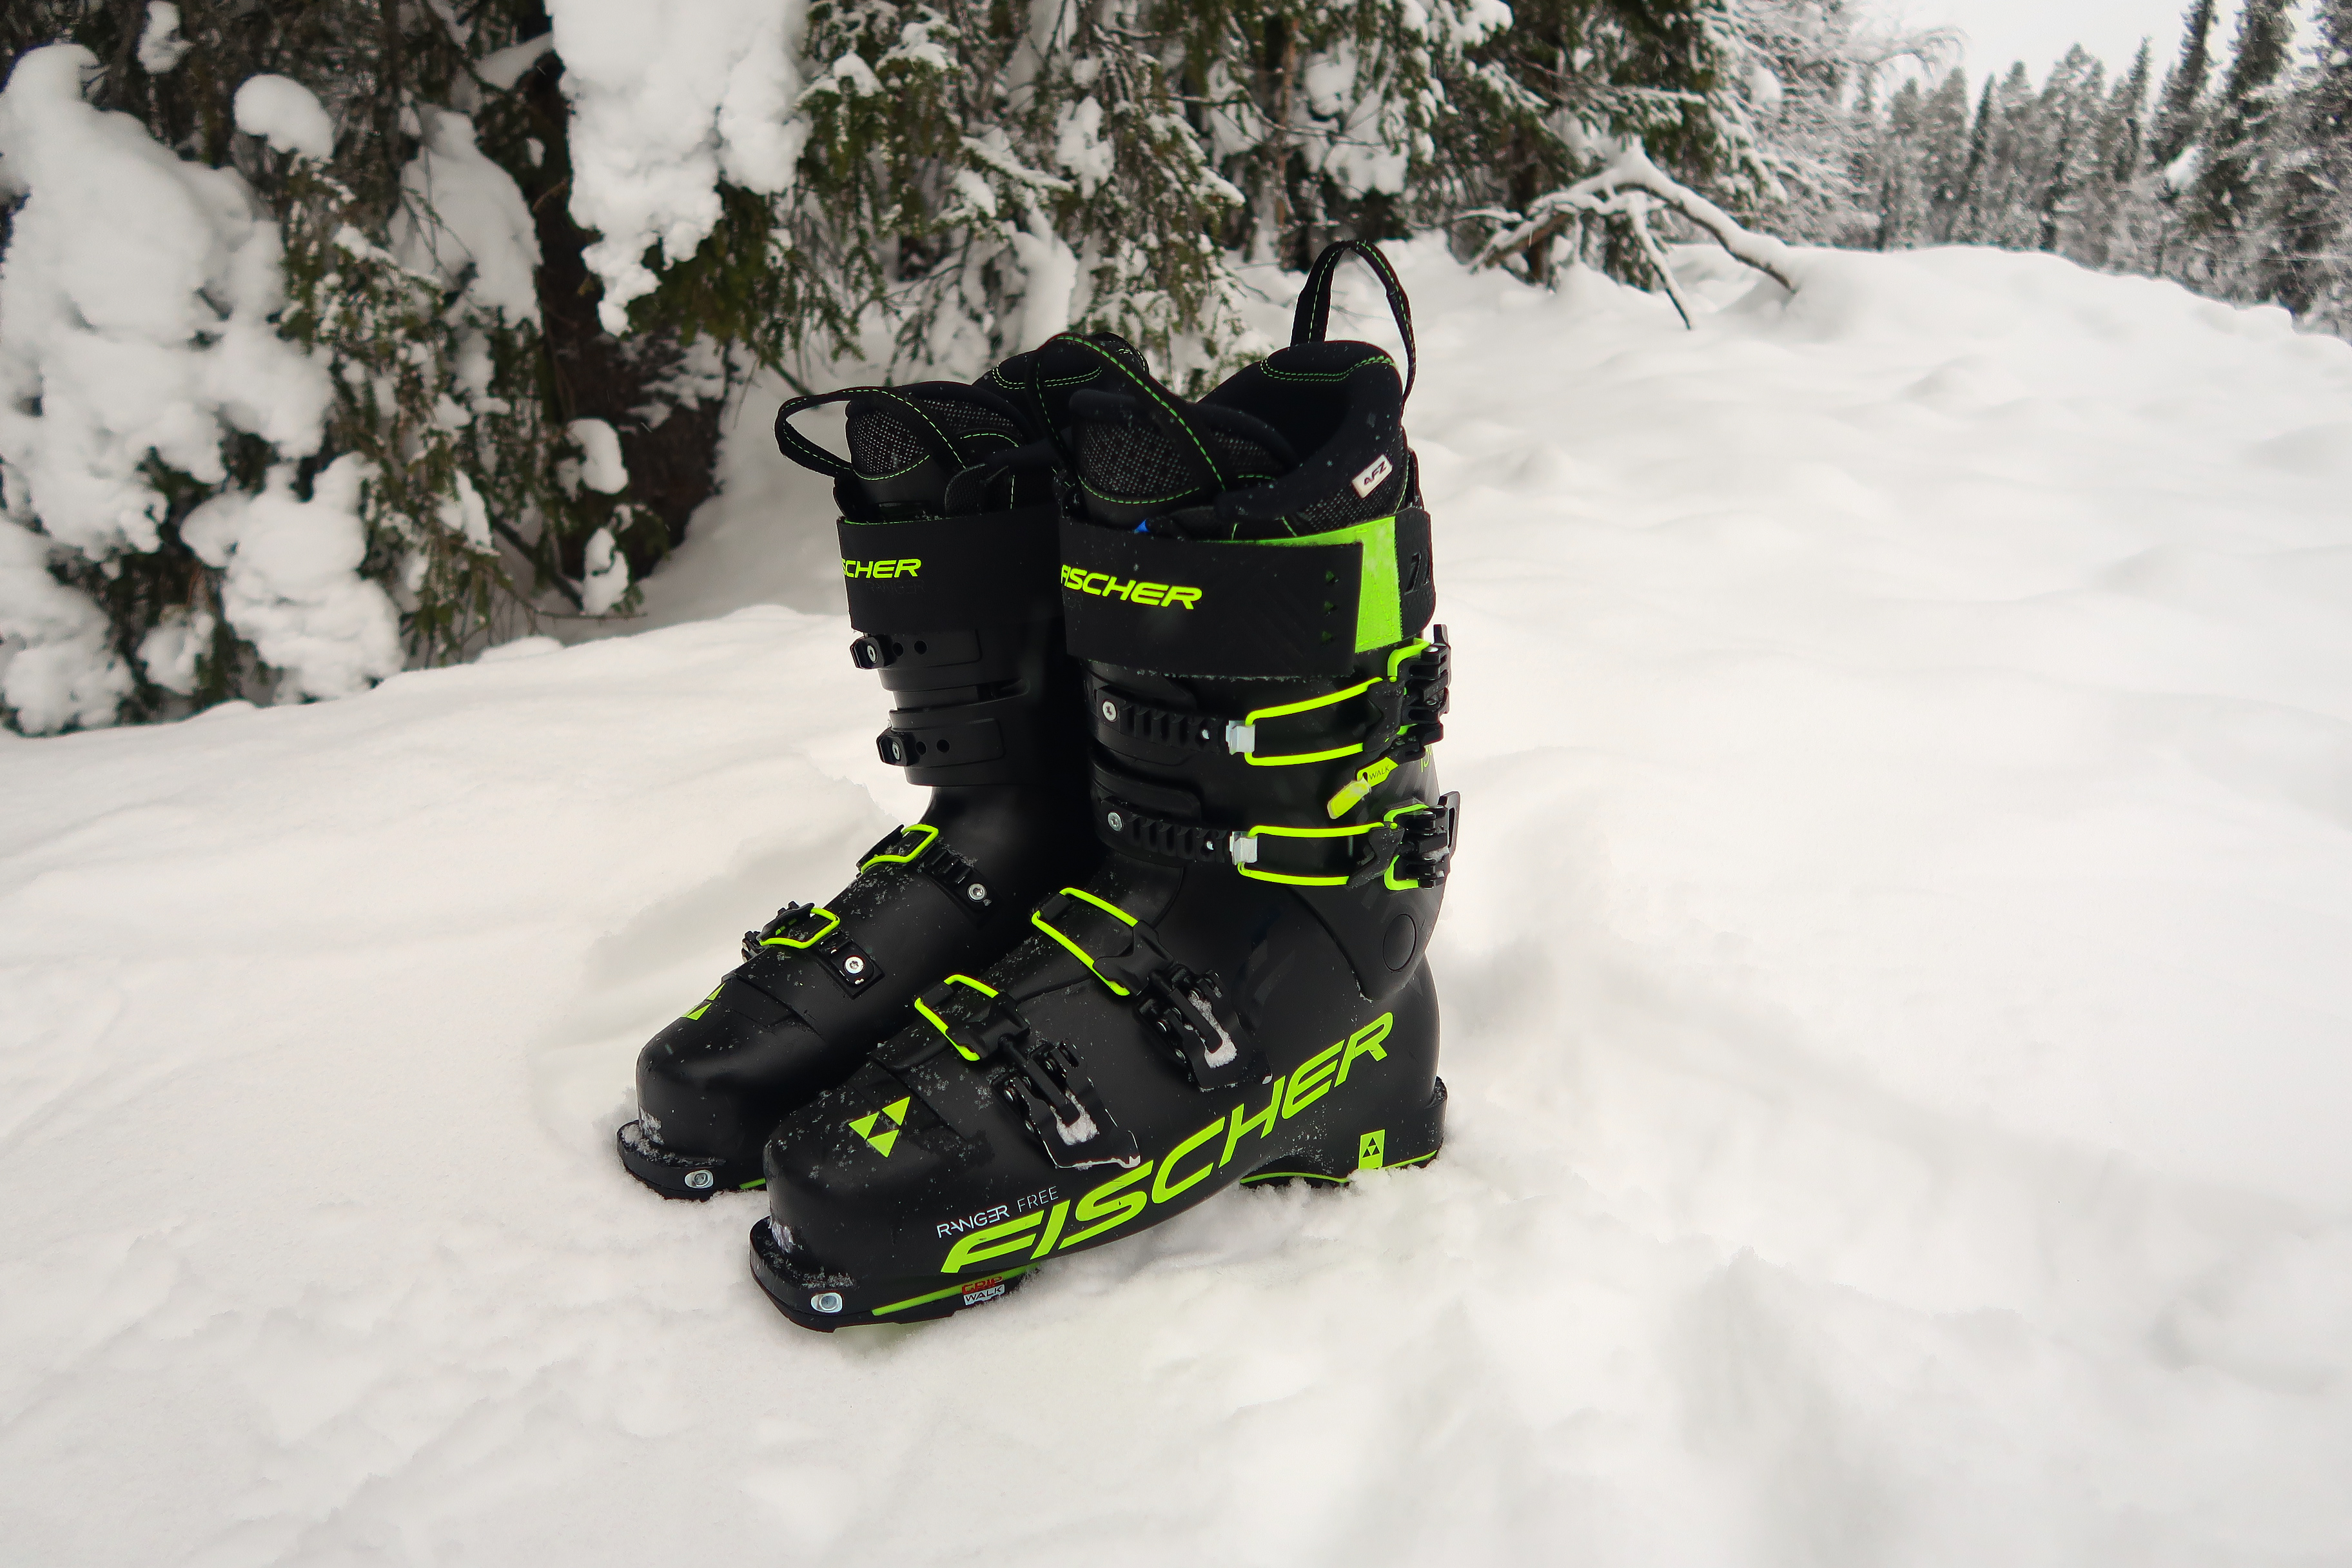 Fischer Ranger Free 130 Alpine Touring Boots - The Gentleman Explorer